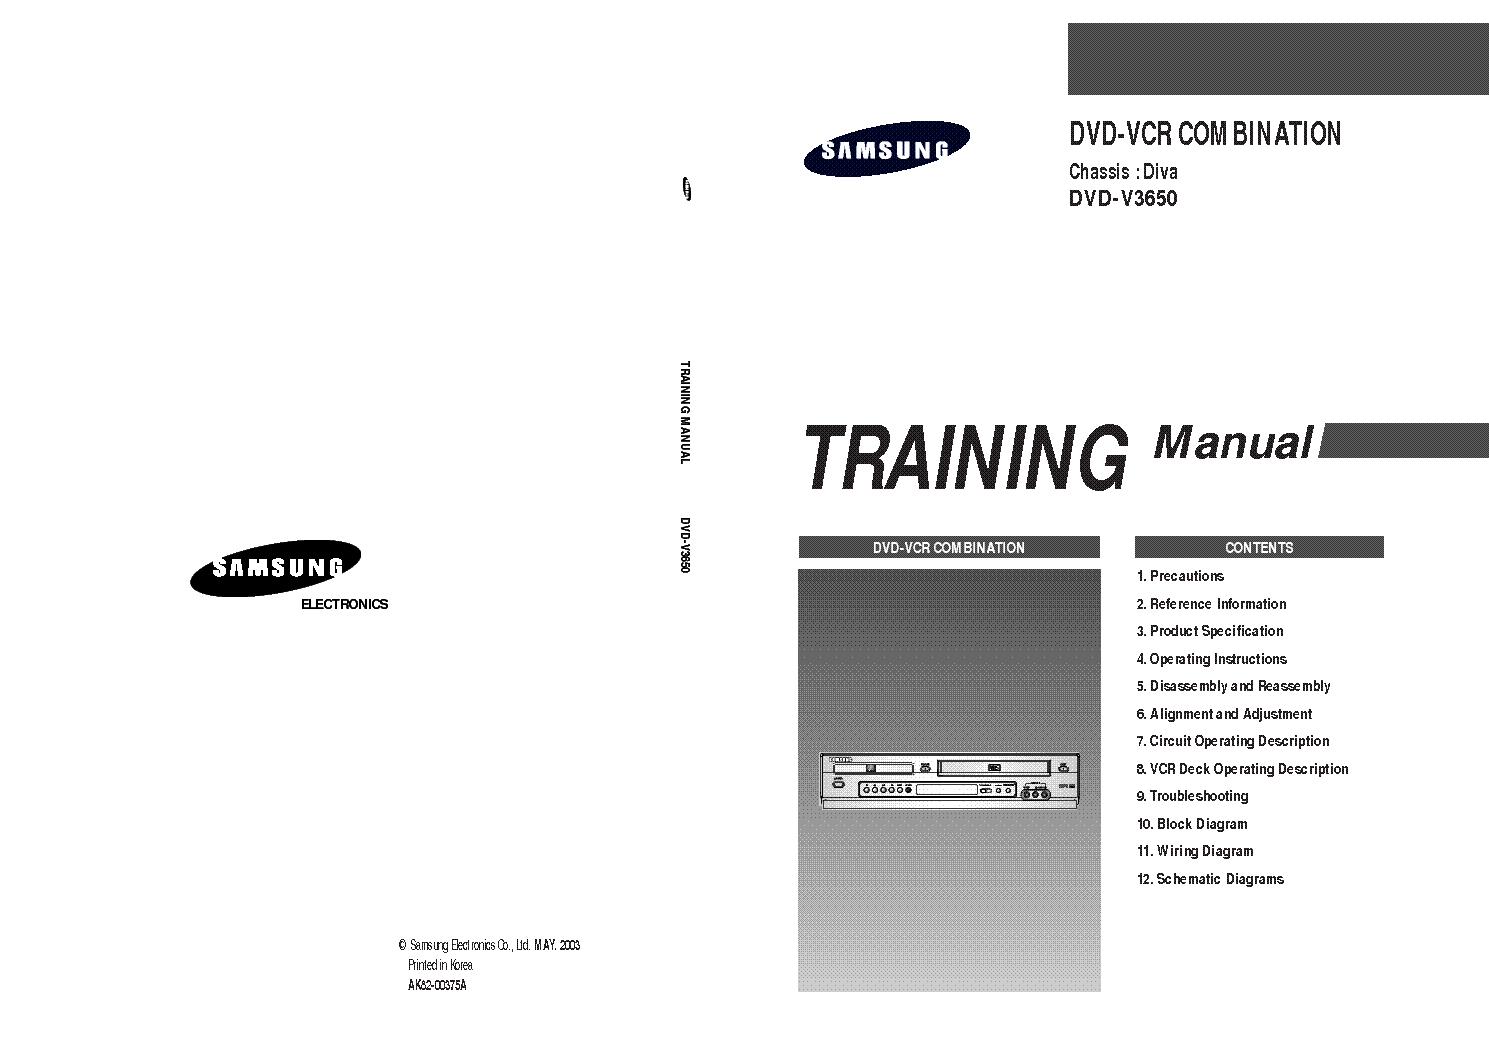 samsung dvd v3650 chassis diva training manual service manual rh elektrotanya com Samsung TV Component Cable Samsung Dryer Troubleshooting Manual